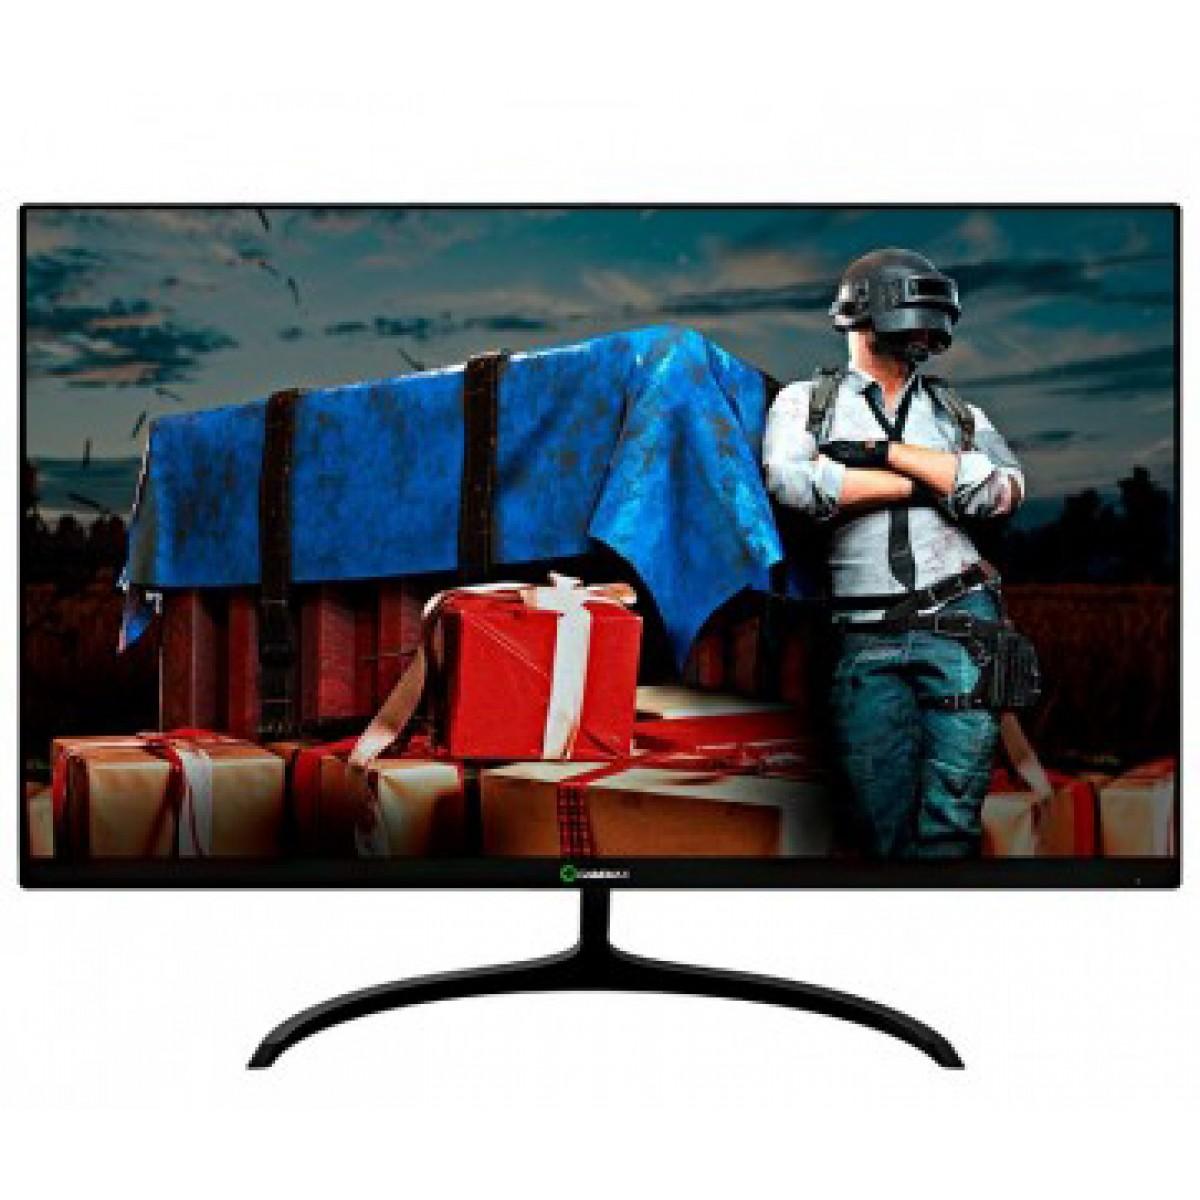 Monitor Gamer GameMax 27 Pol, Quad HD, 144Hz, 1ms, Black, GMX27F144Q